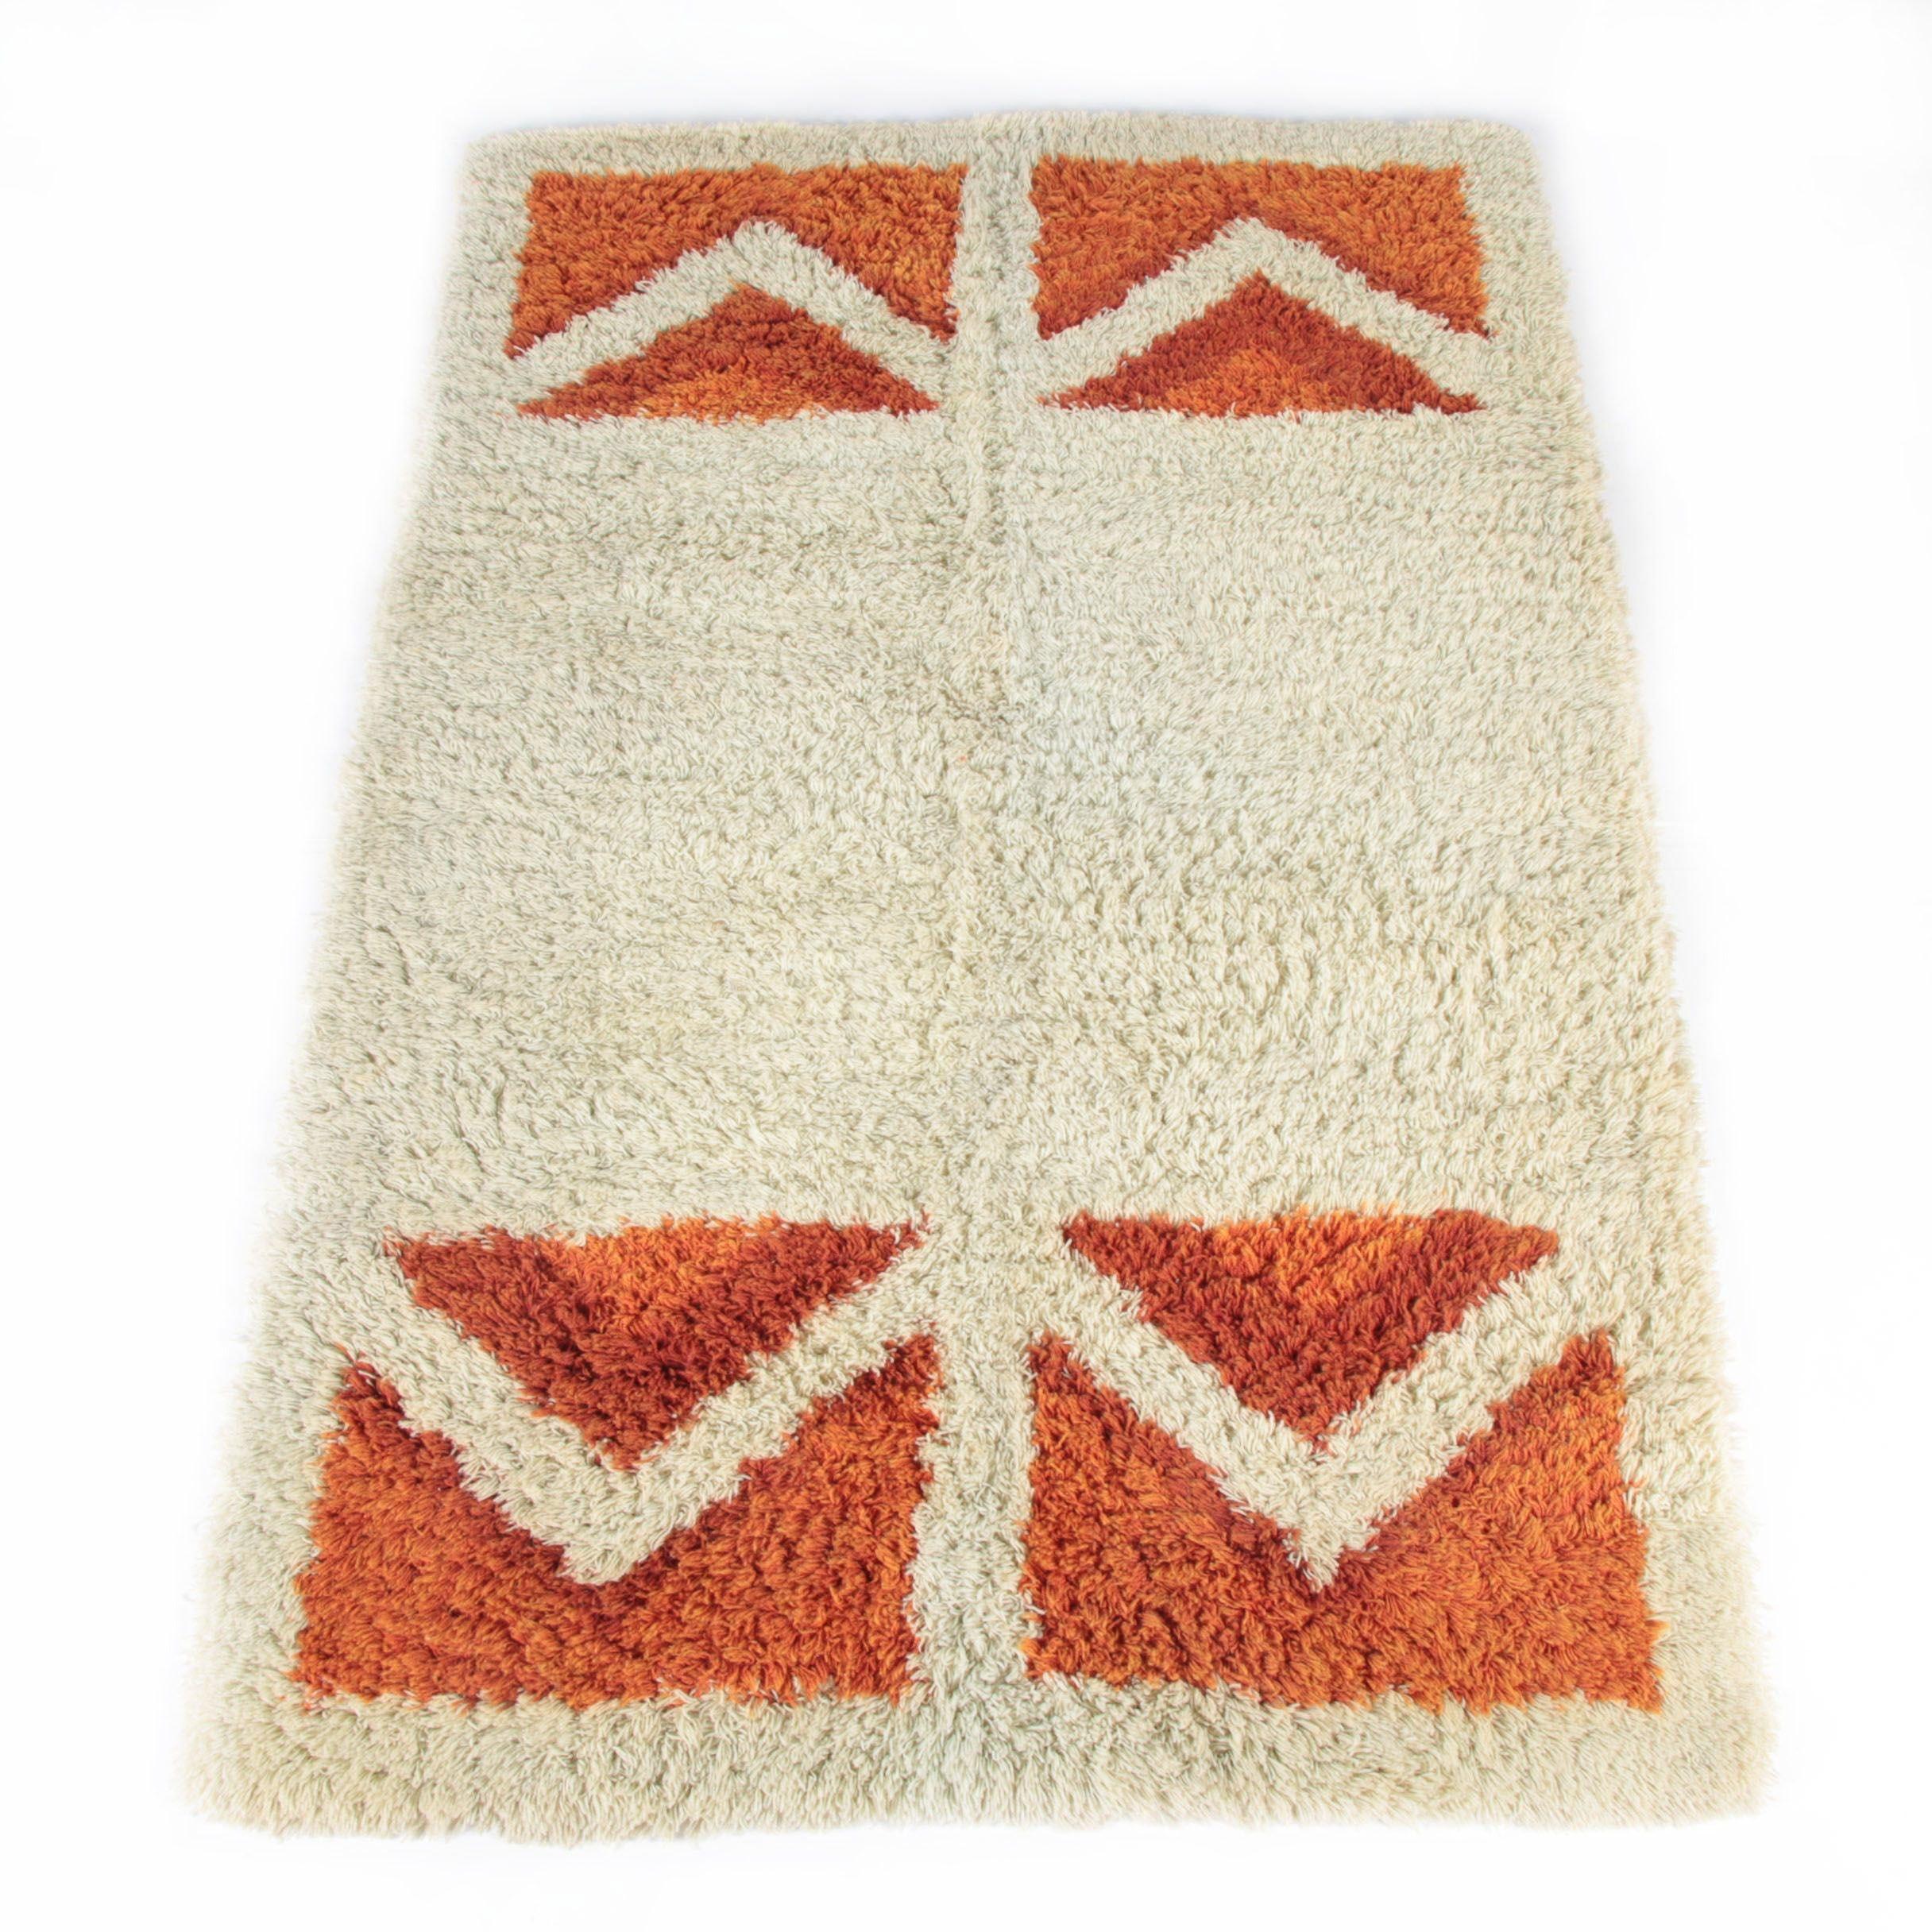 Mid Century Modern Style Tufted Wool Area Rug